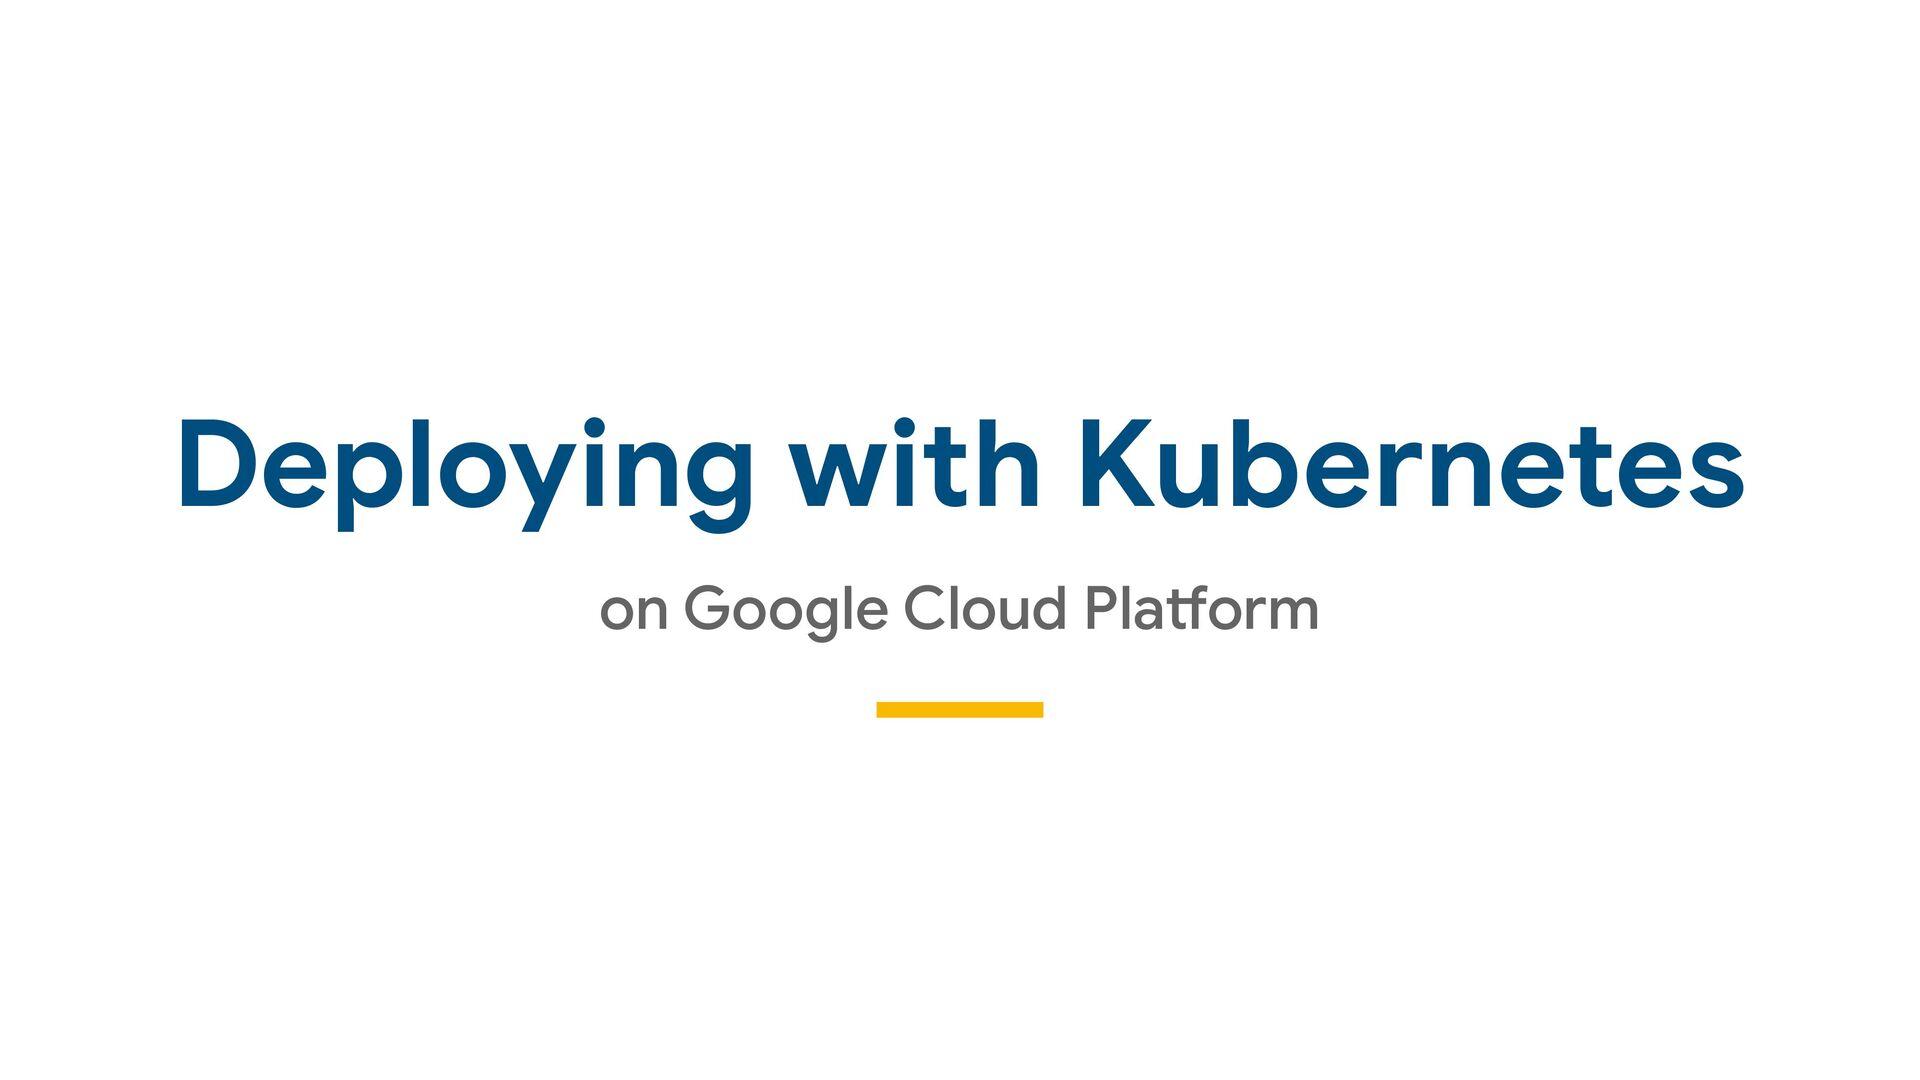 Deploying with Kubernetes on Google Cloud Pla-o...